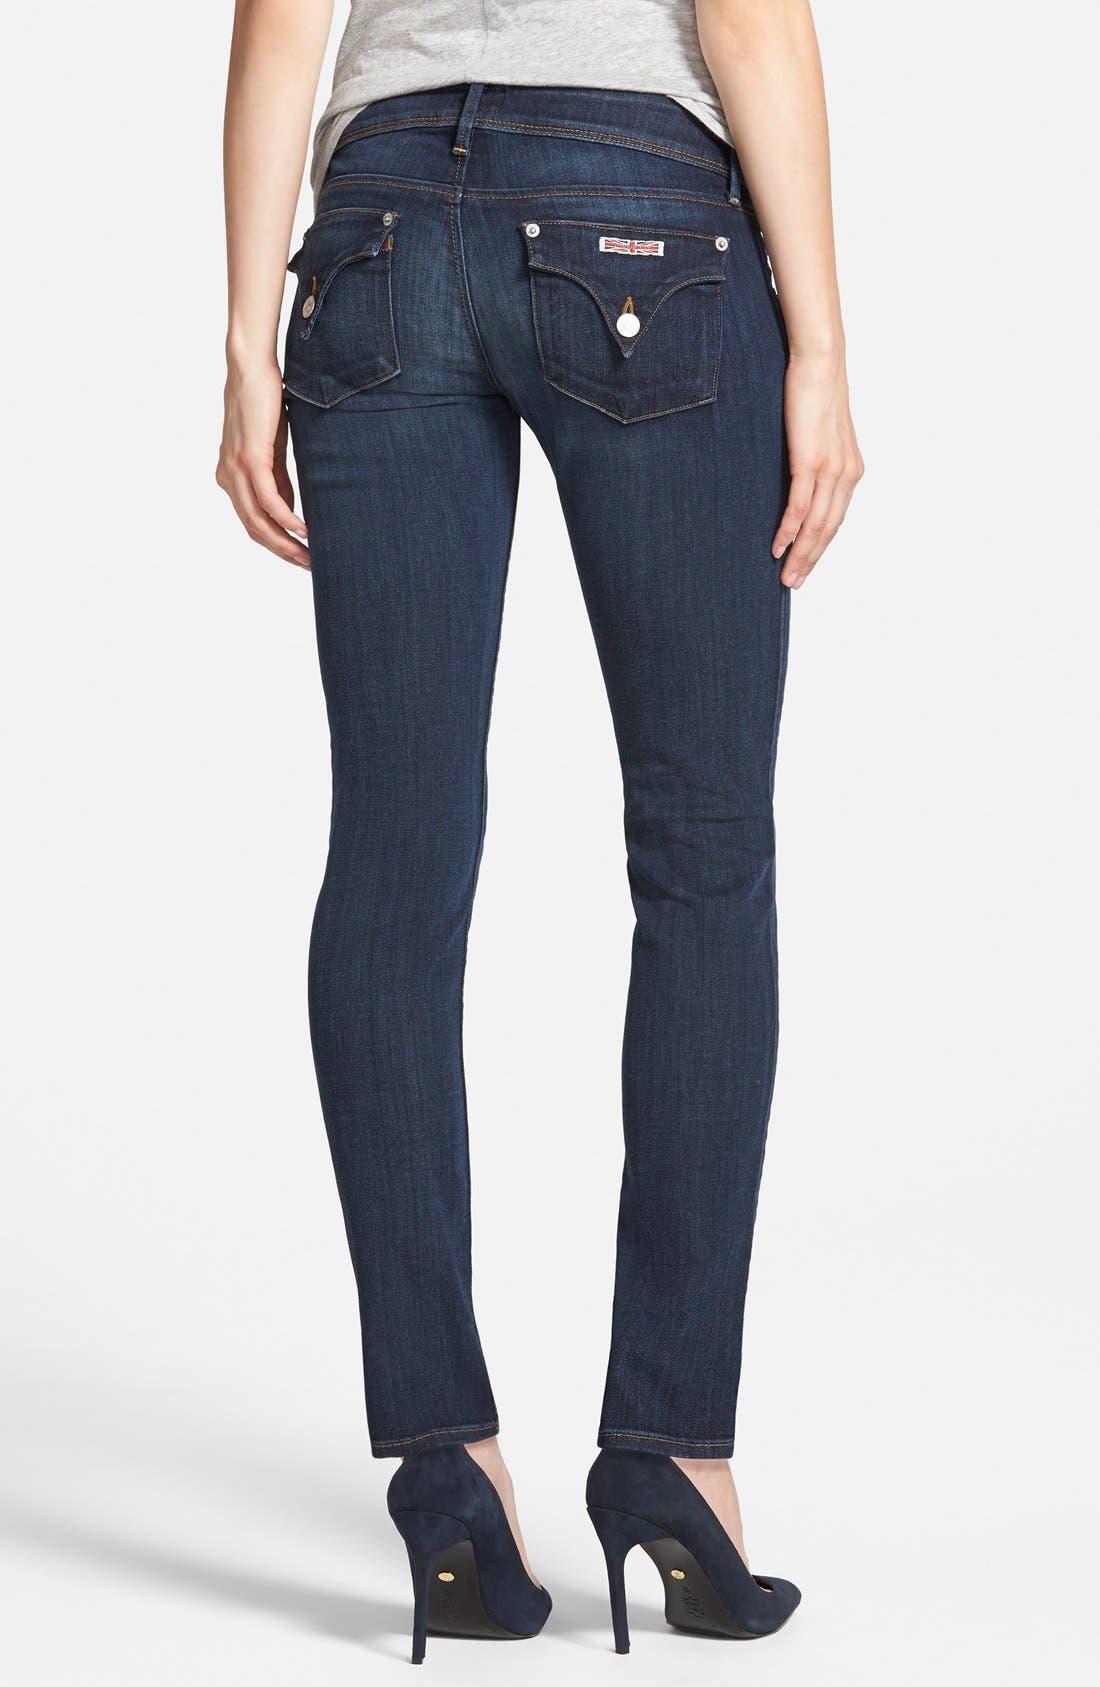 'Collin' Skinny Jeans,                             Alternate thumbnail 2, color,                             401